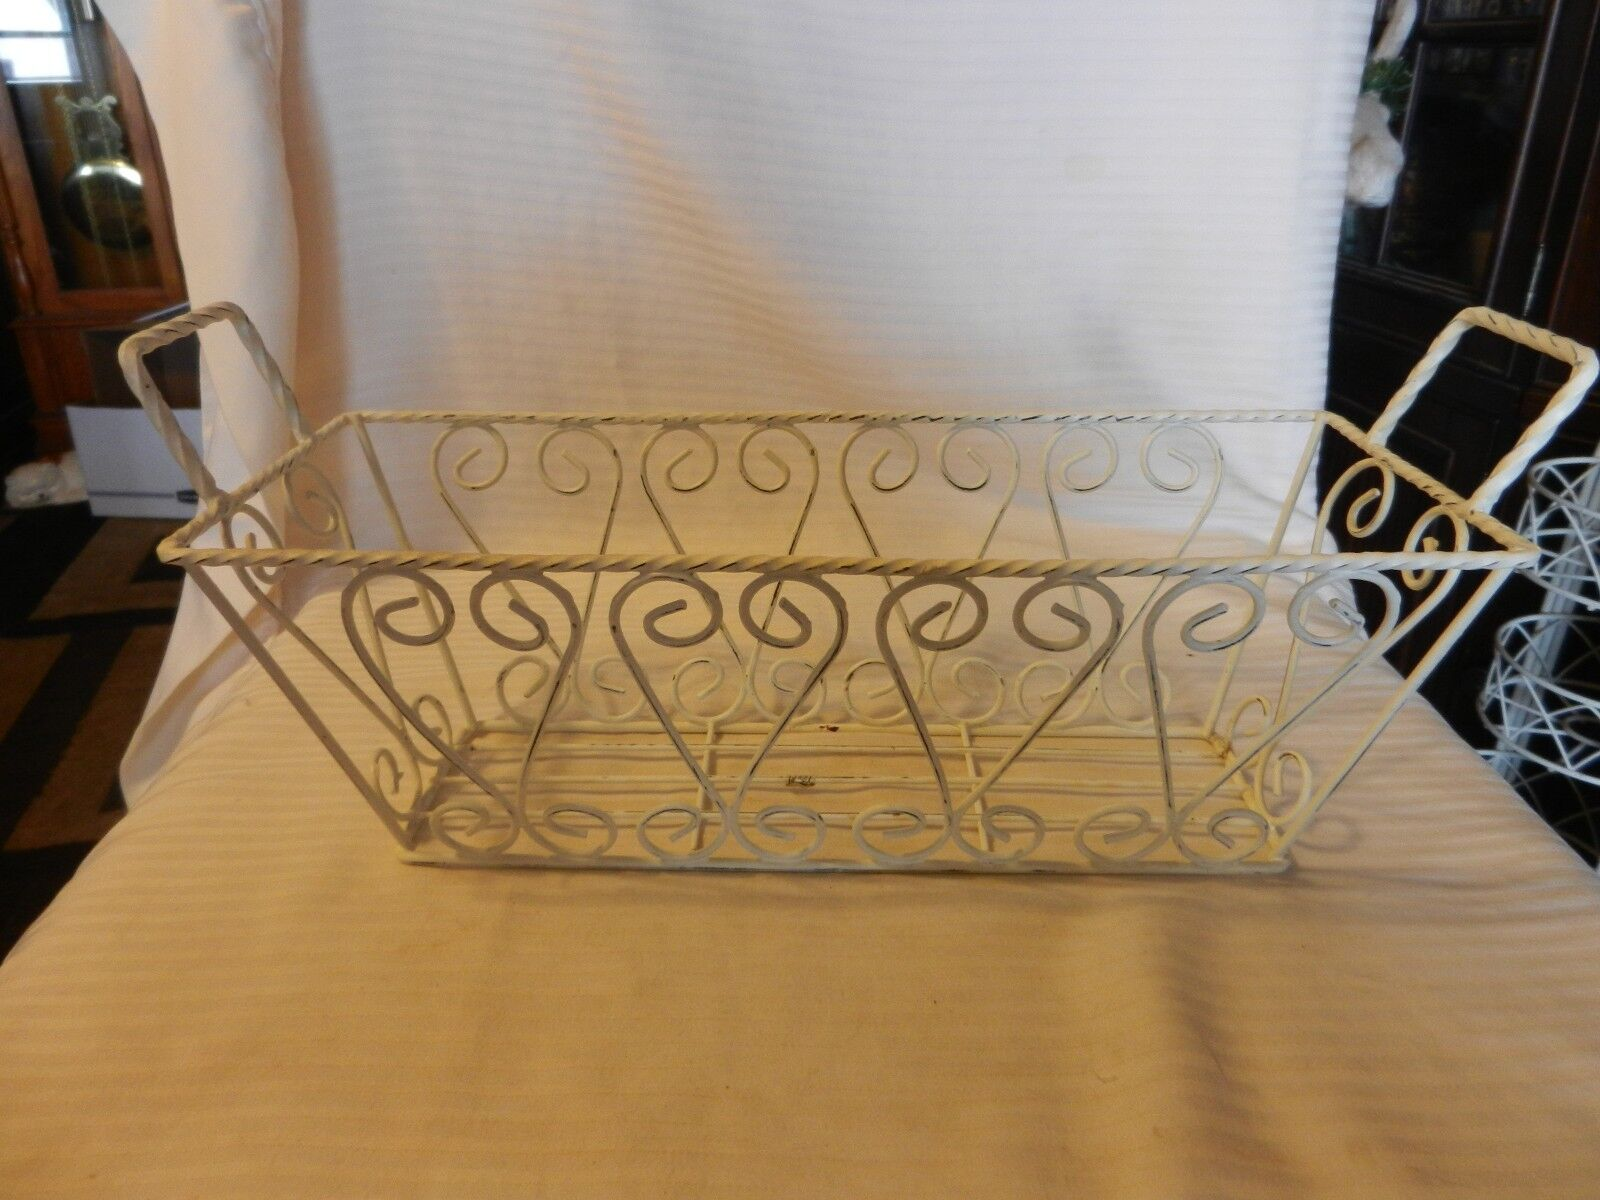 Decorative White Metal Rectangular Basket With Handles, Wire Design